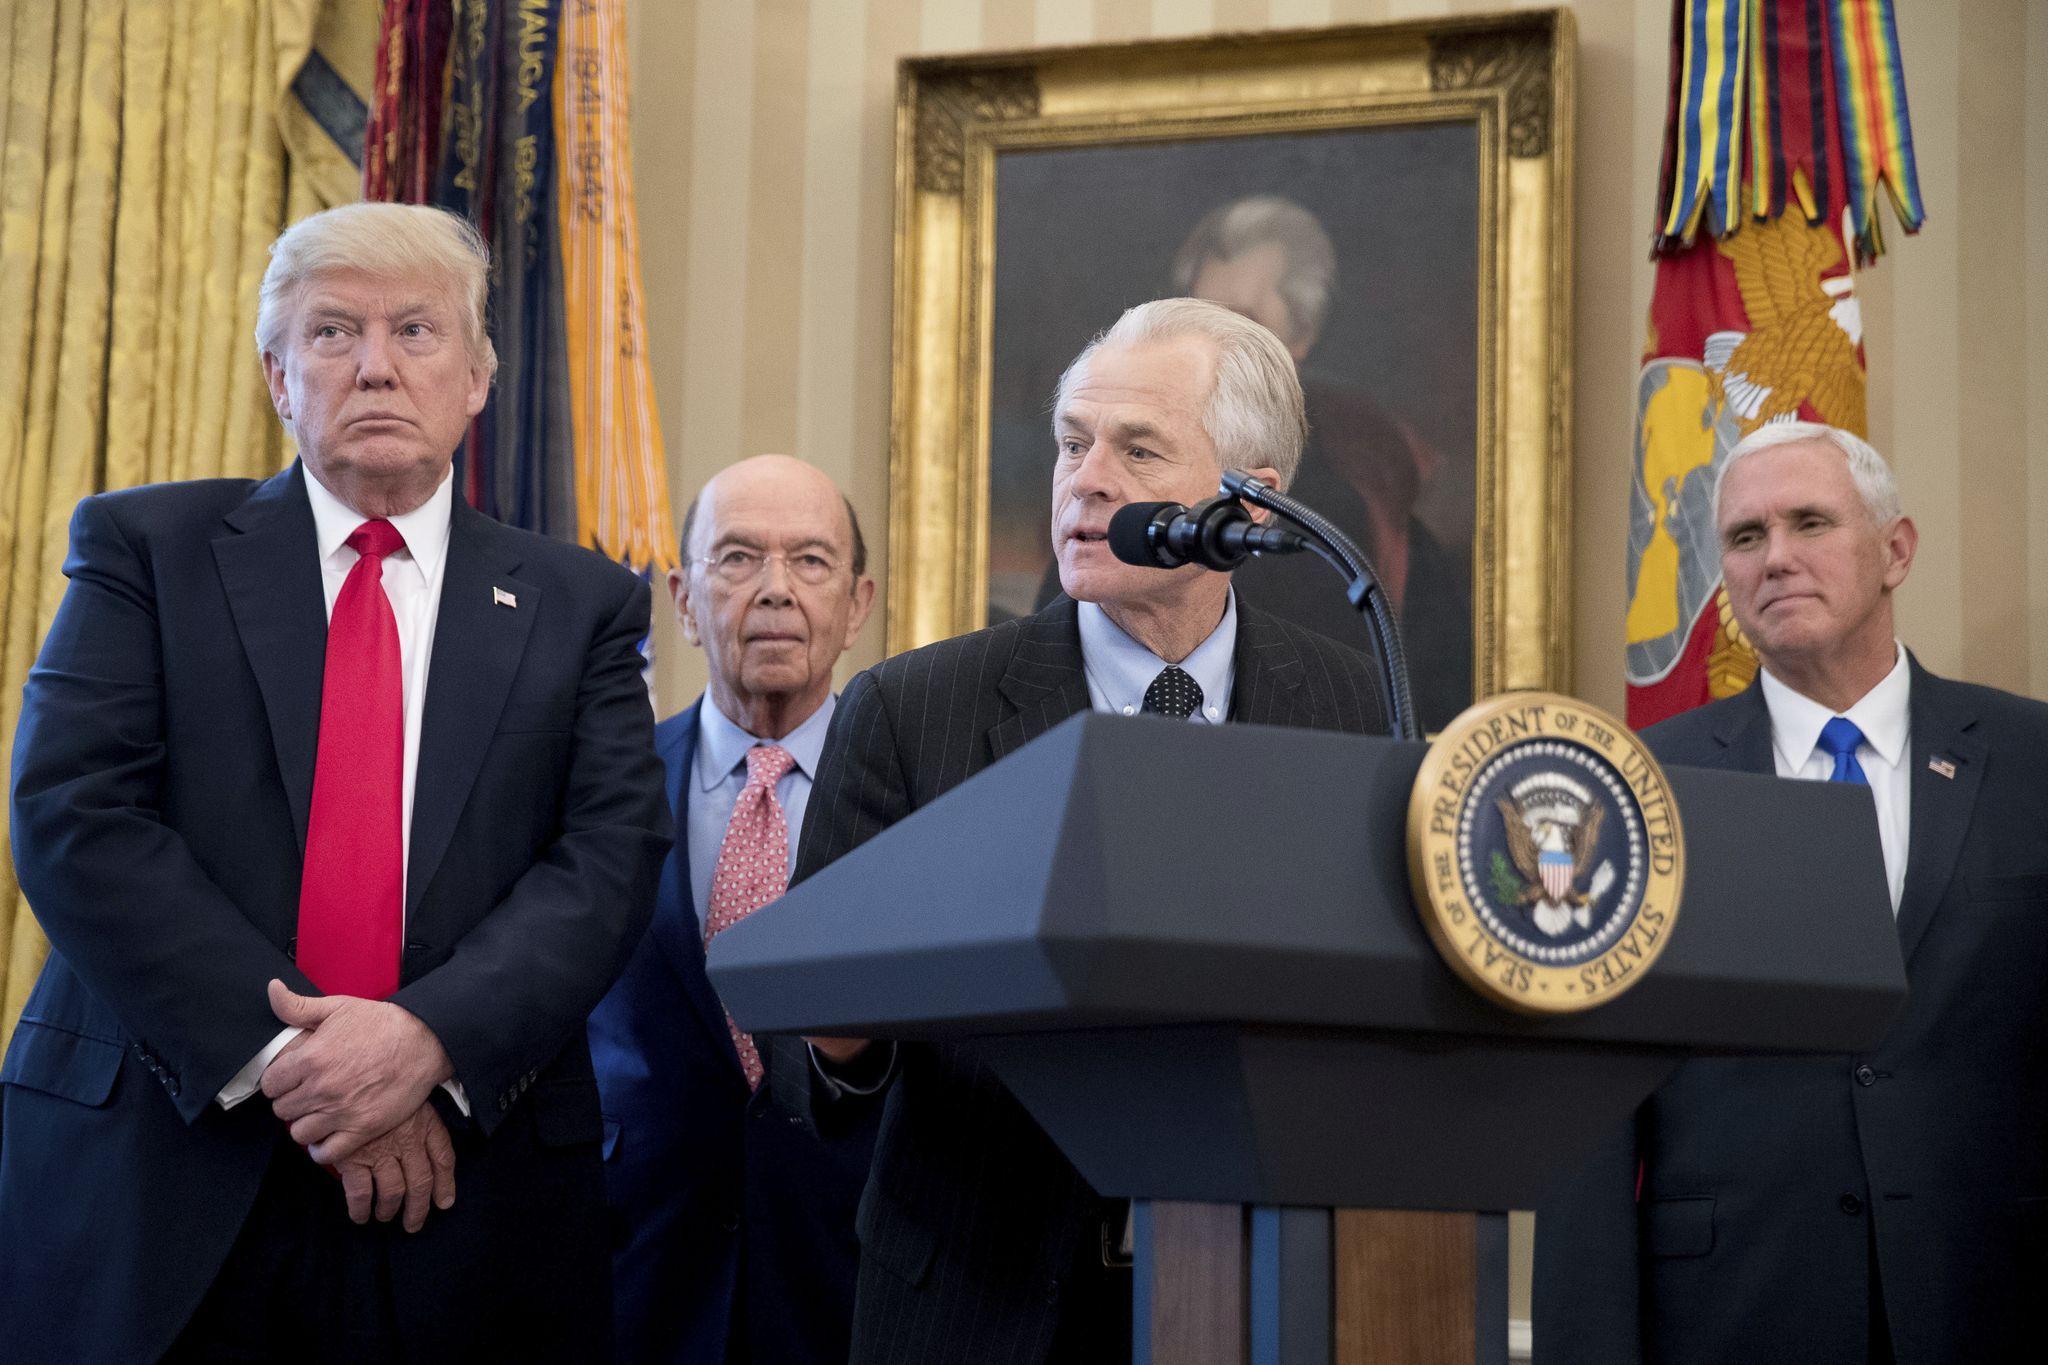 Aide Provides No Comfort For Trump S Troubled Trade Agenda Trump White House The European Union